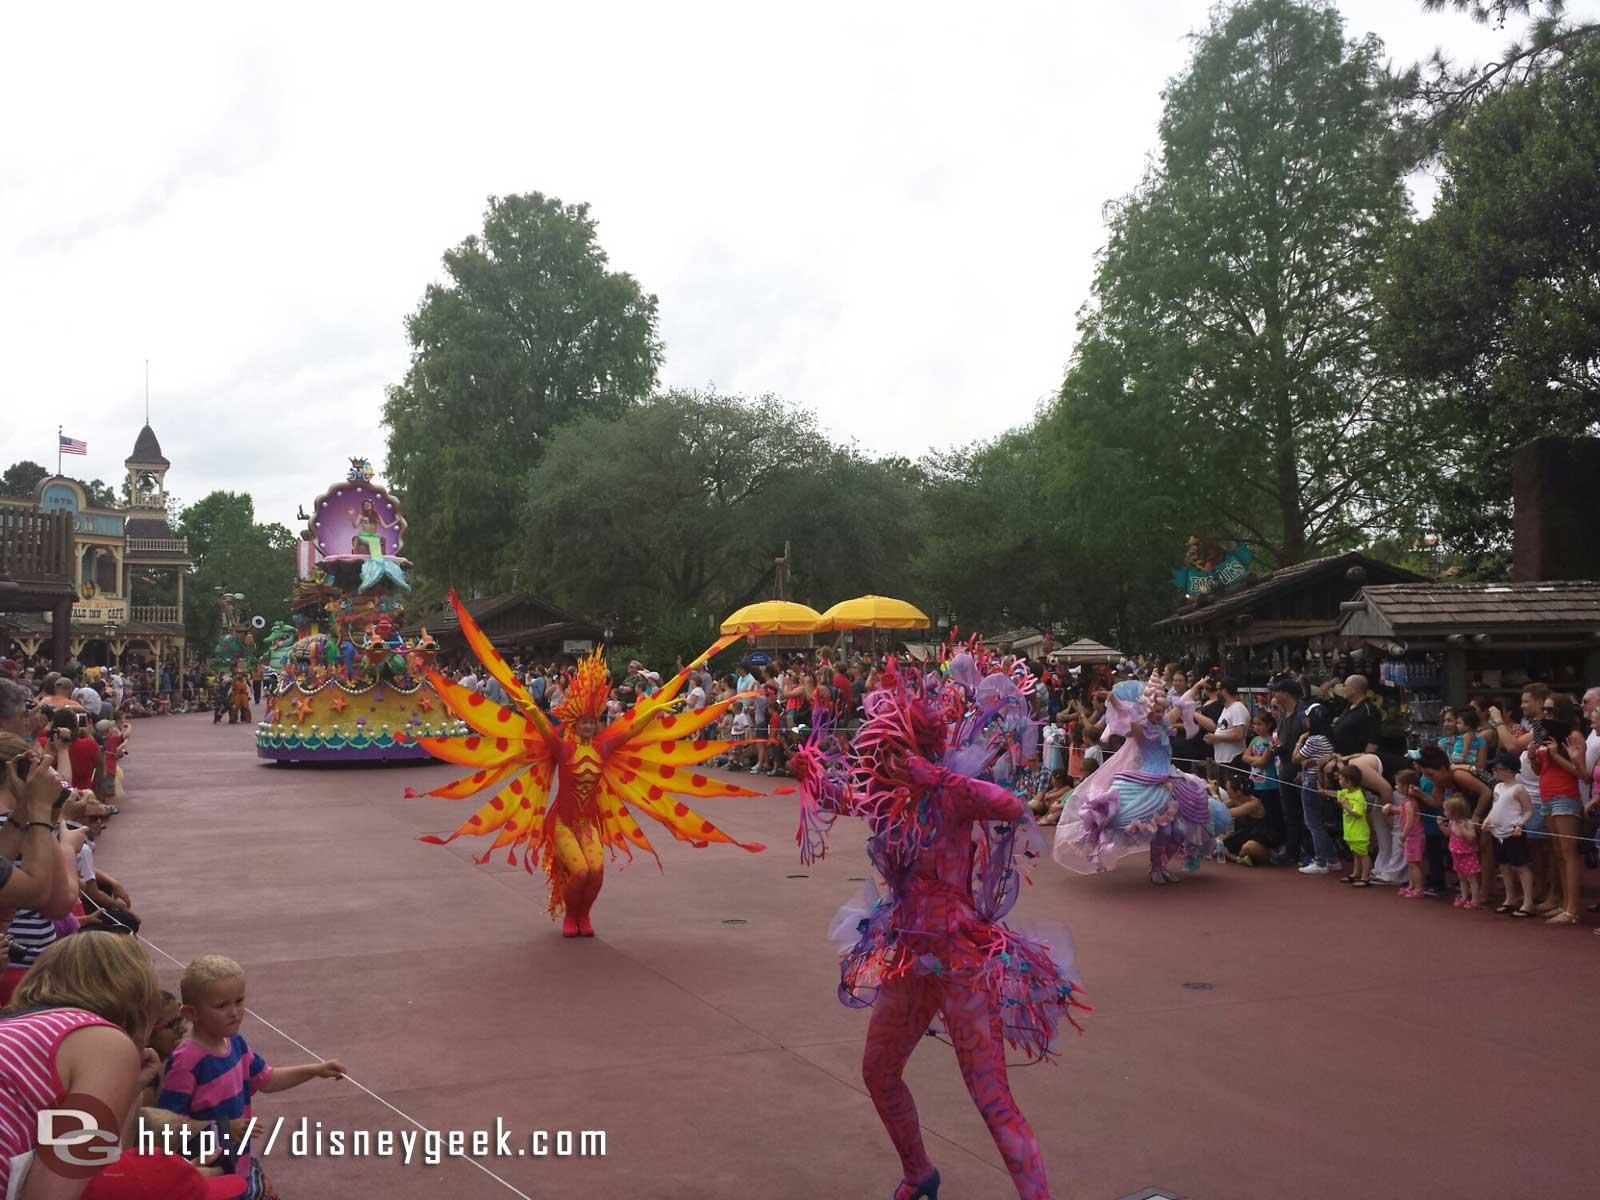 Festival of Fantasy Parade - the Little Mermaid